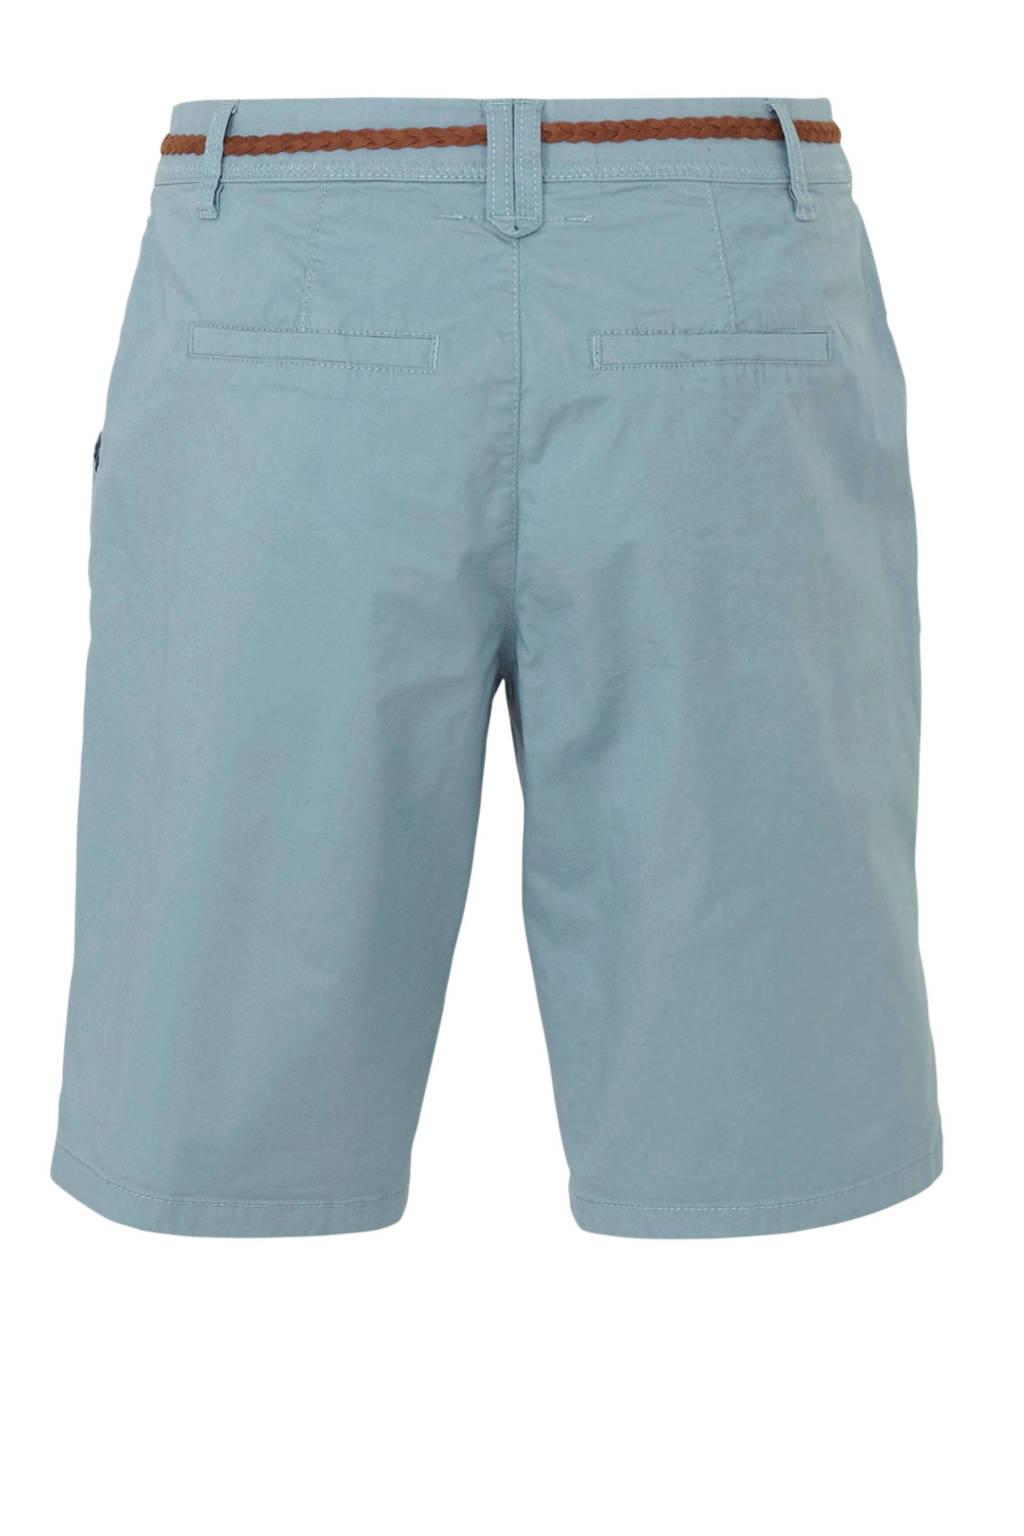 C&A Yessica regular fit bermuda blauw, Blauw